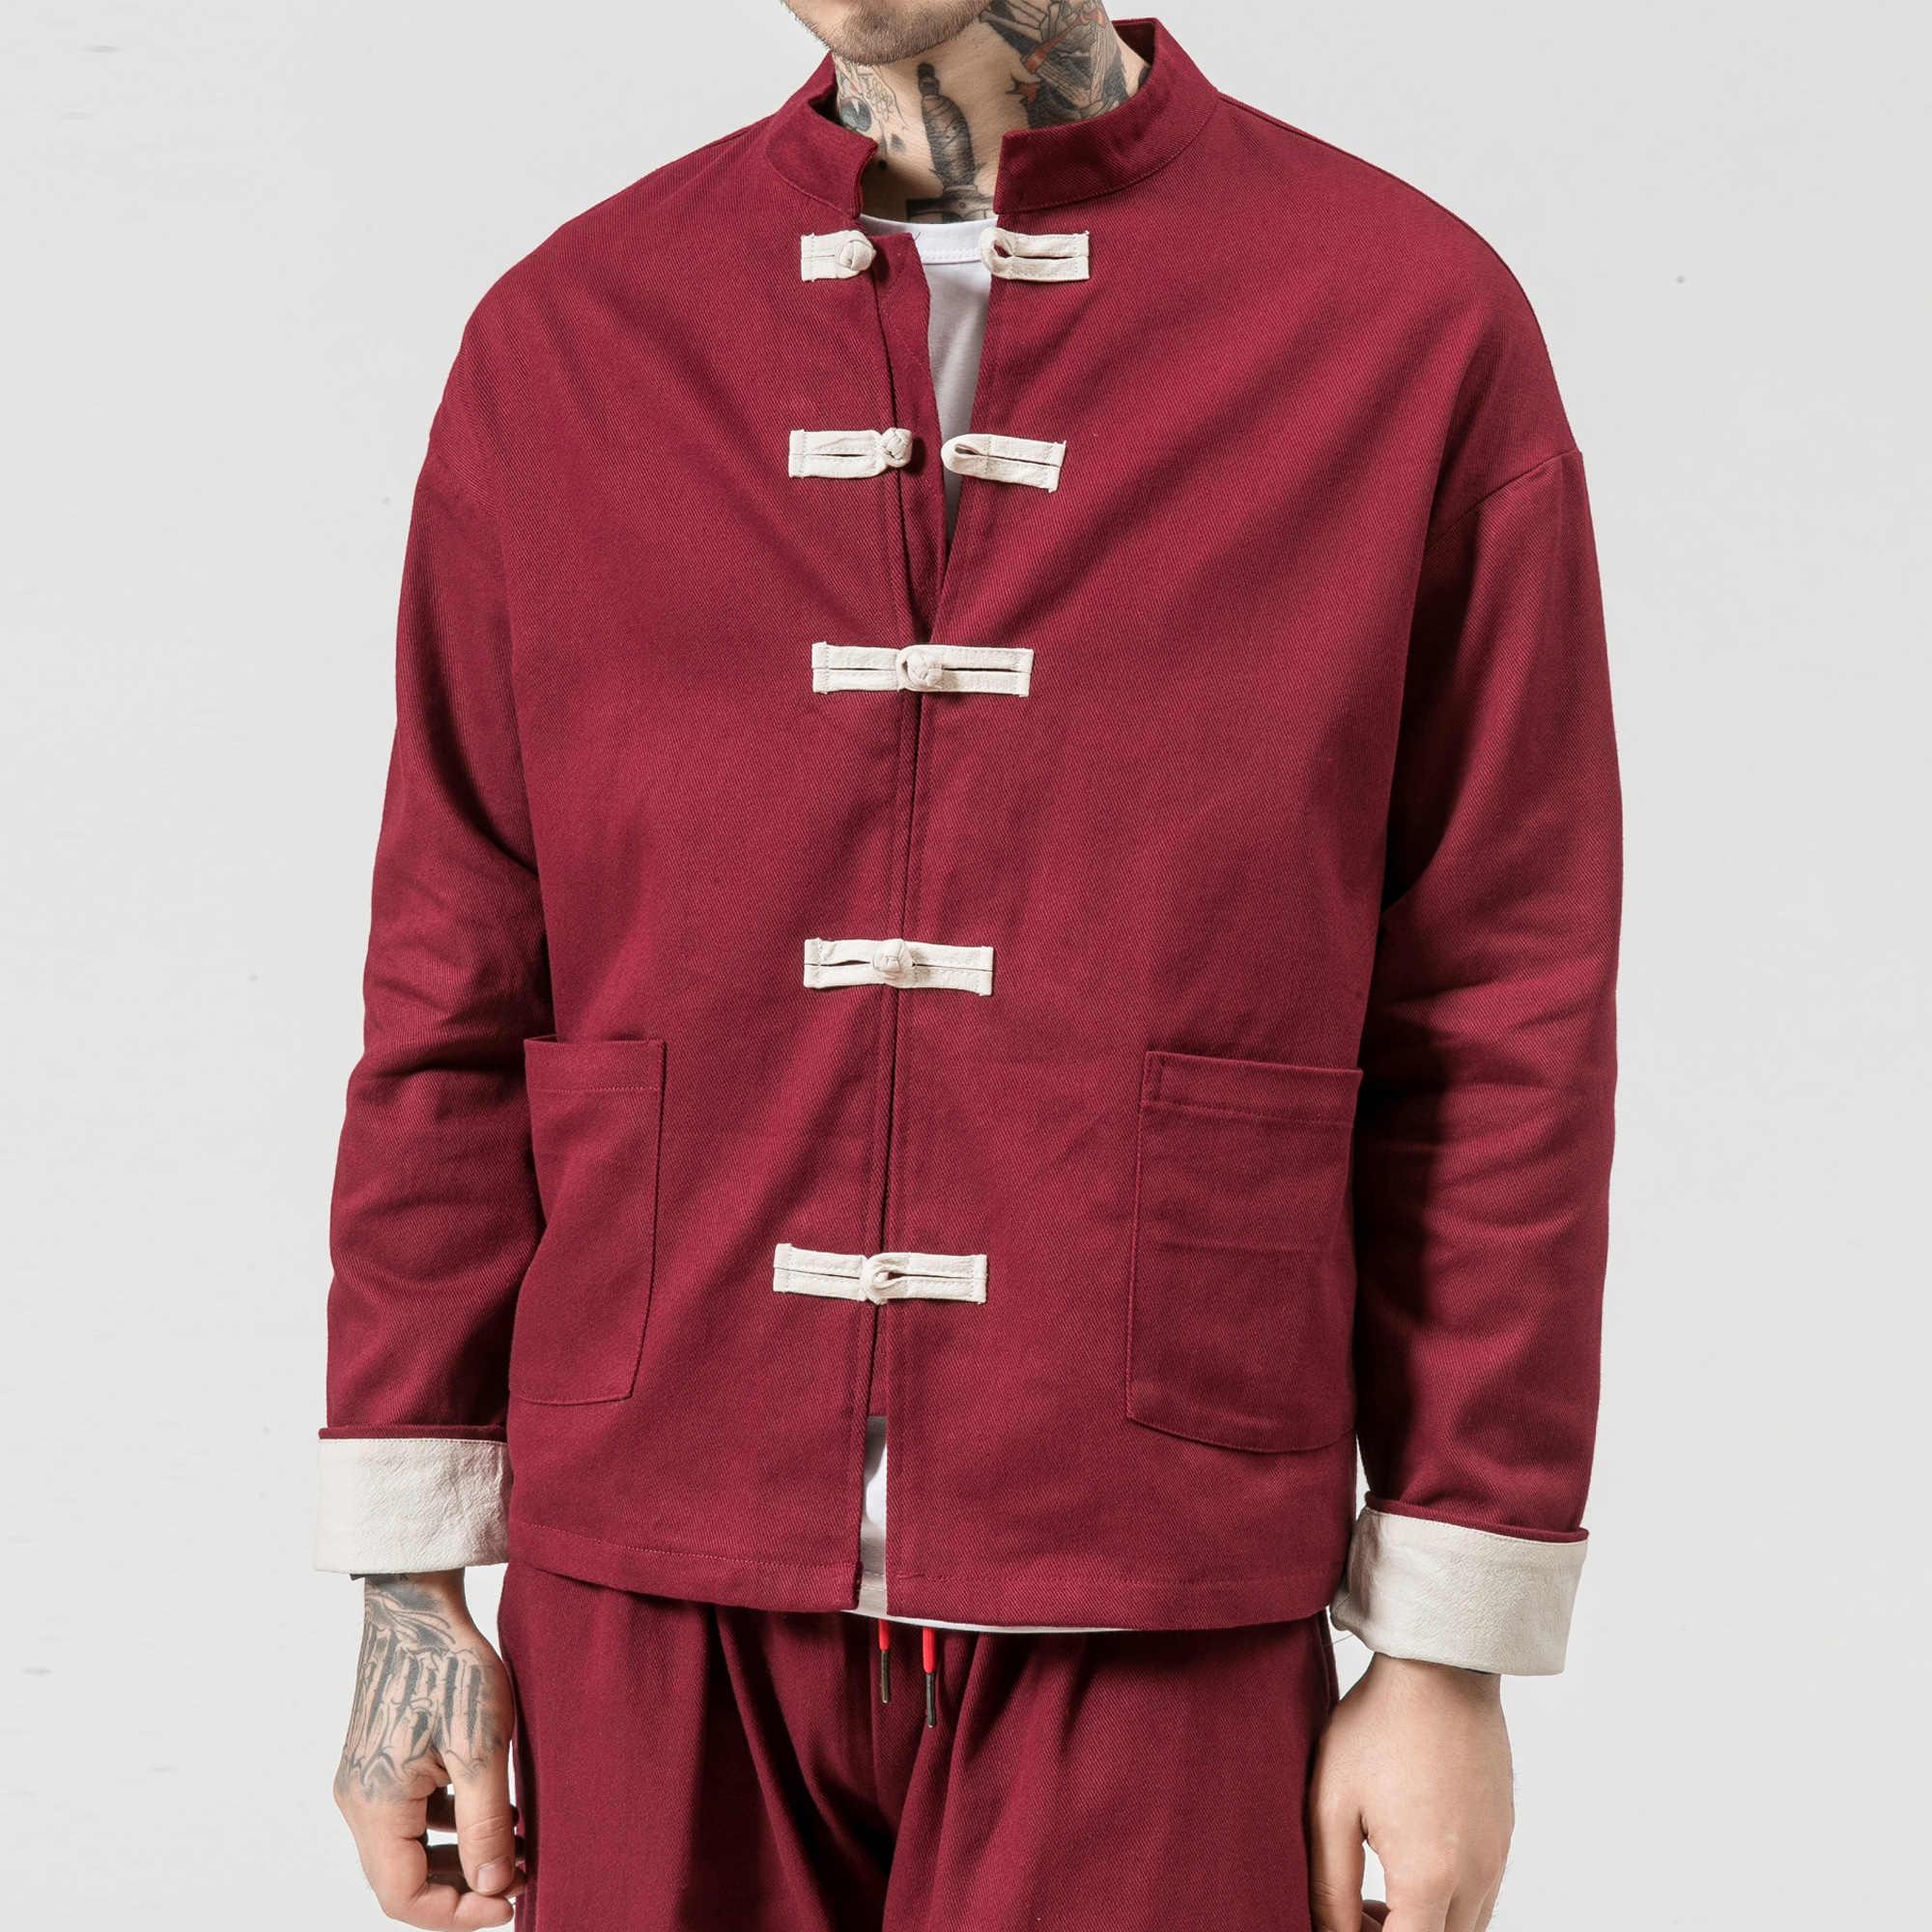 Kimono Jas Mannen 2019 Mannen Katoenen Jas China Stijl Kikker Sluiting Knop Kongfu Jas Mannelijke Losse Parchwork Vest Overjas 5XL